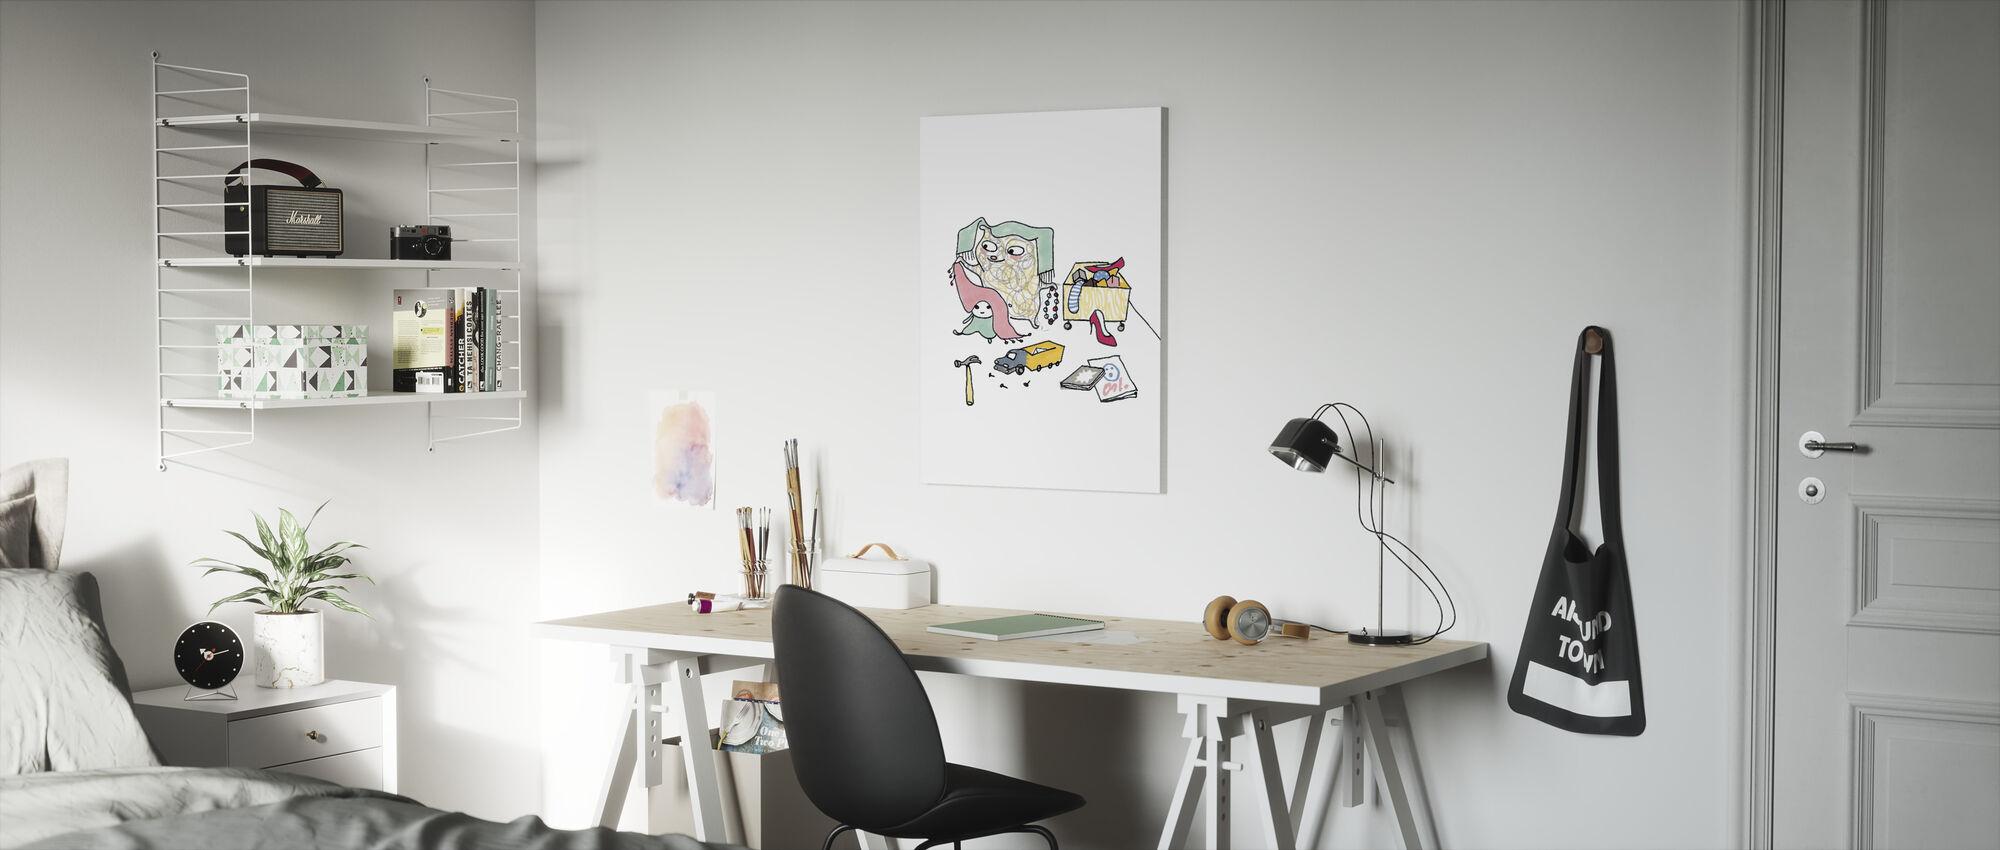 Whose toys - Canvas print - Kids Room